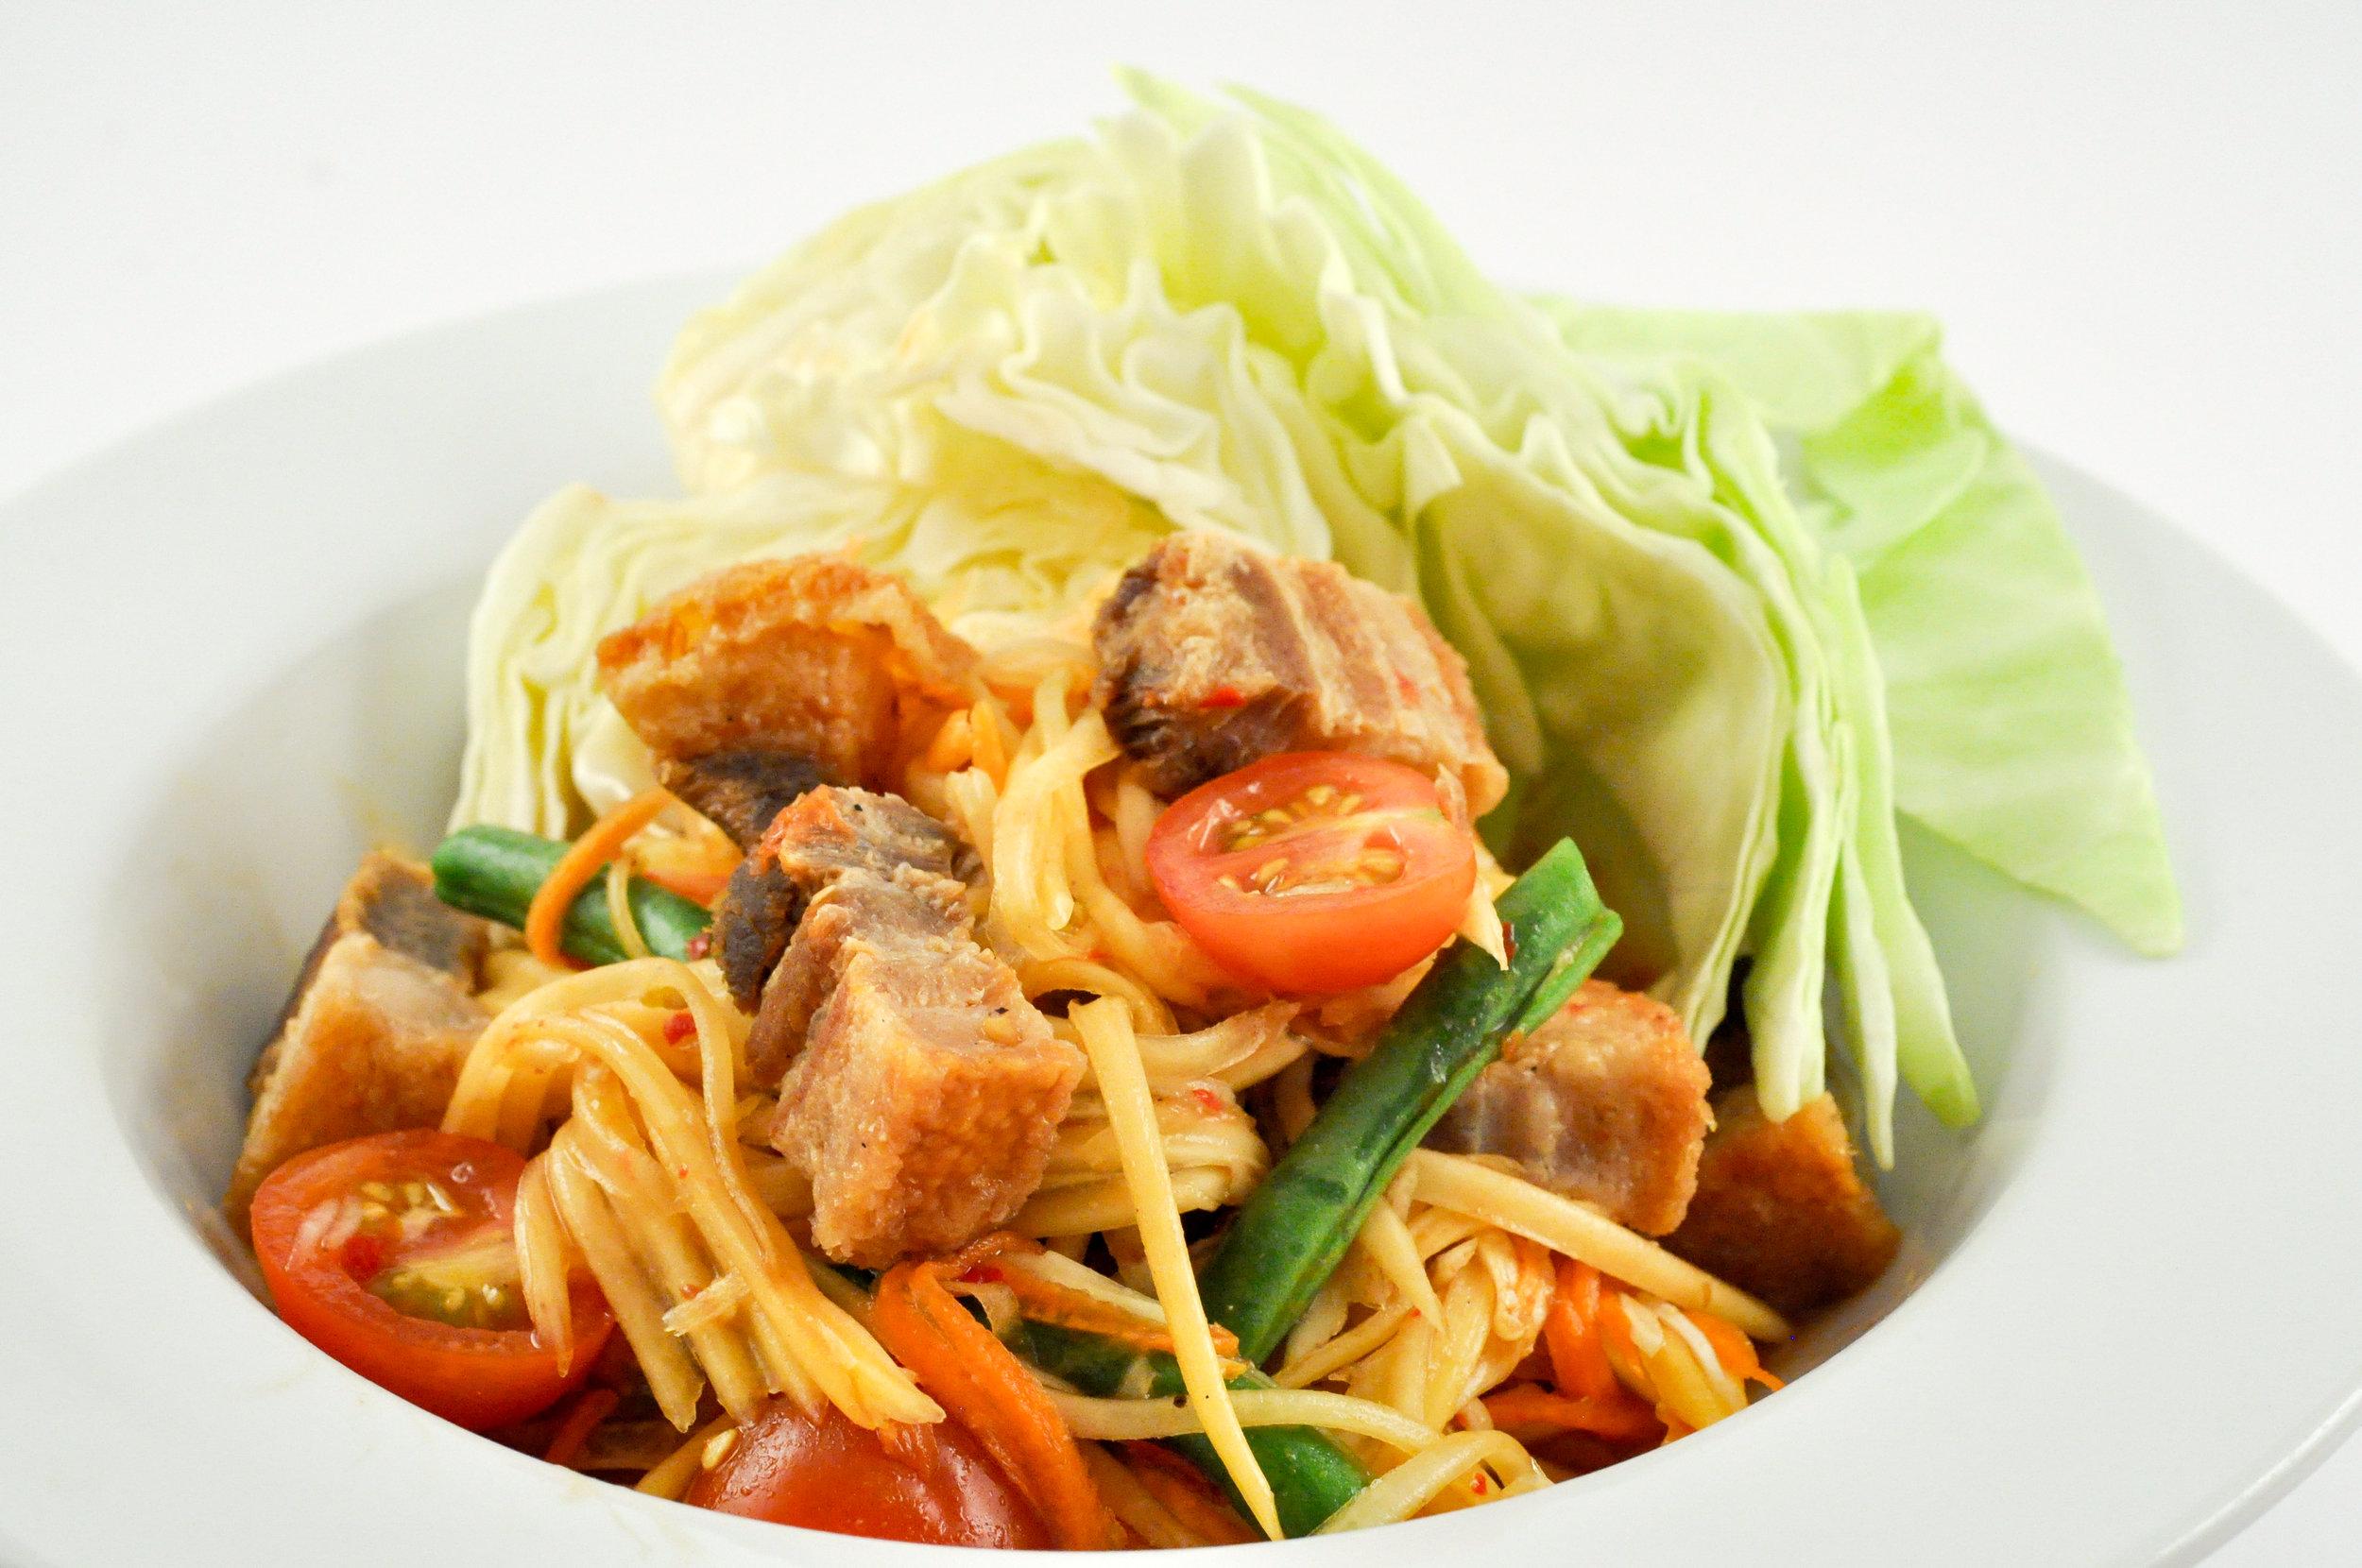 Tum Moo Krob - Papaya Salad with Crispy Pork Belly